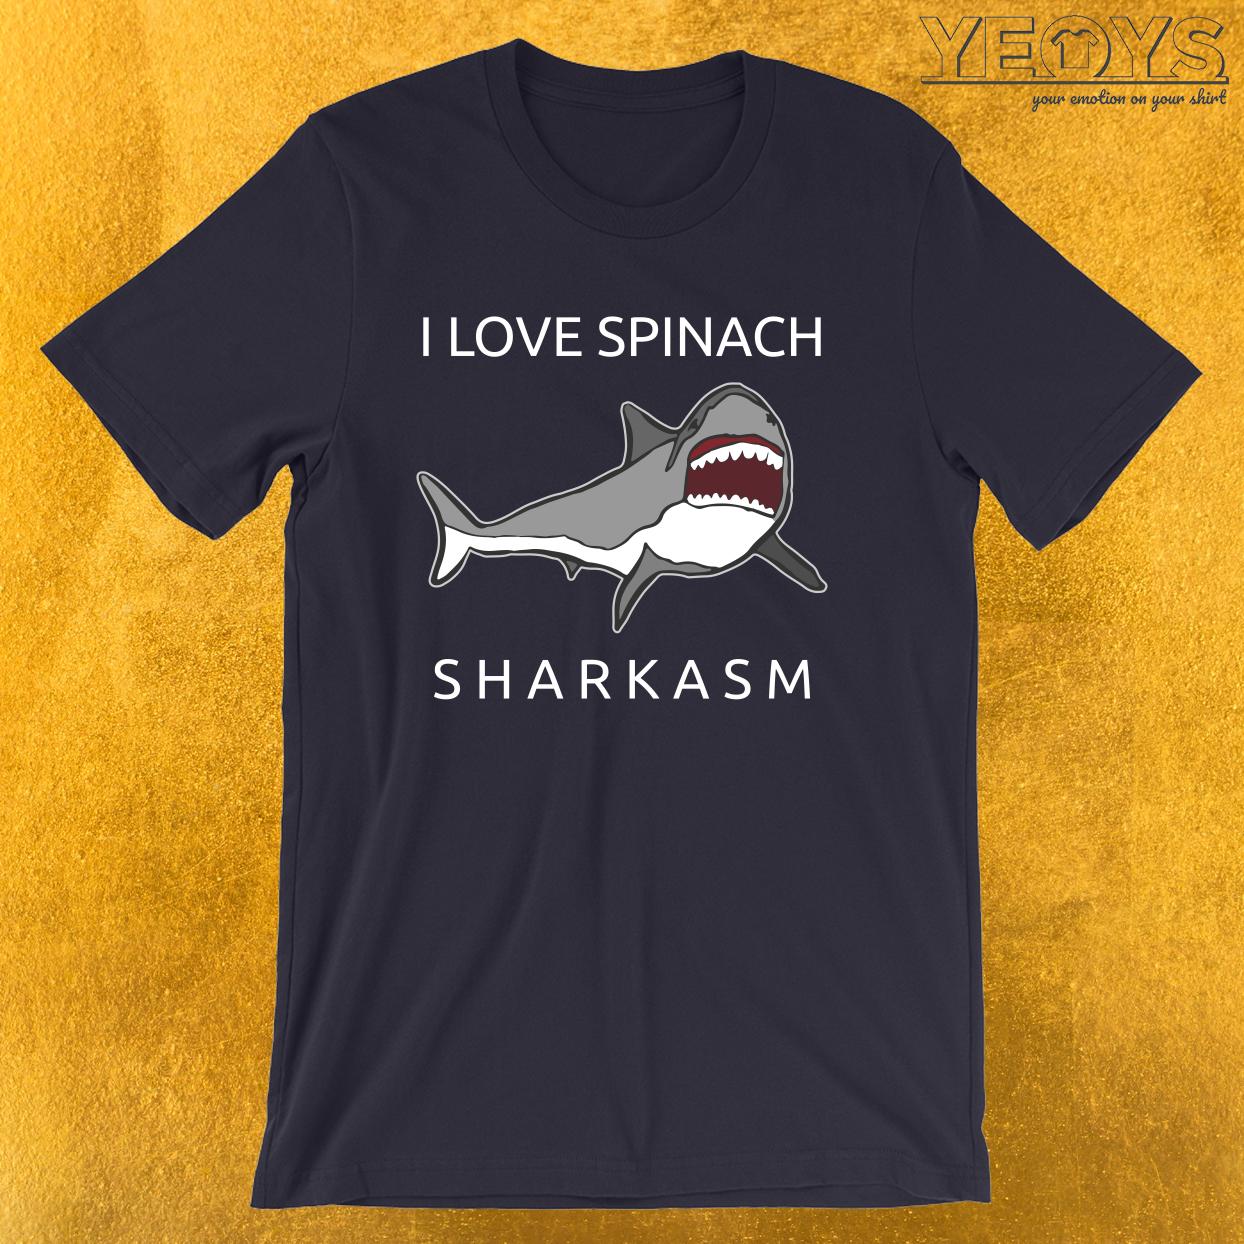 Funny Shark Pun – I Love Spinach Sharkasm Tee